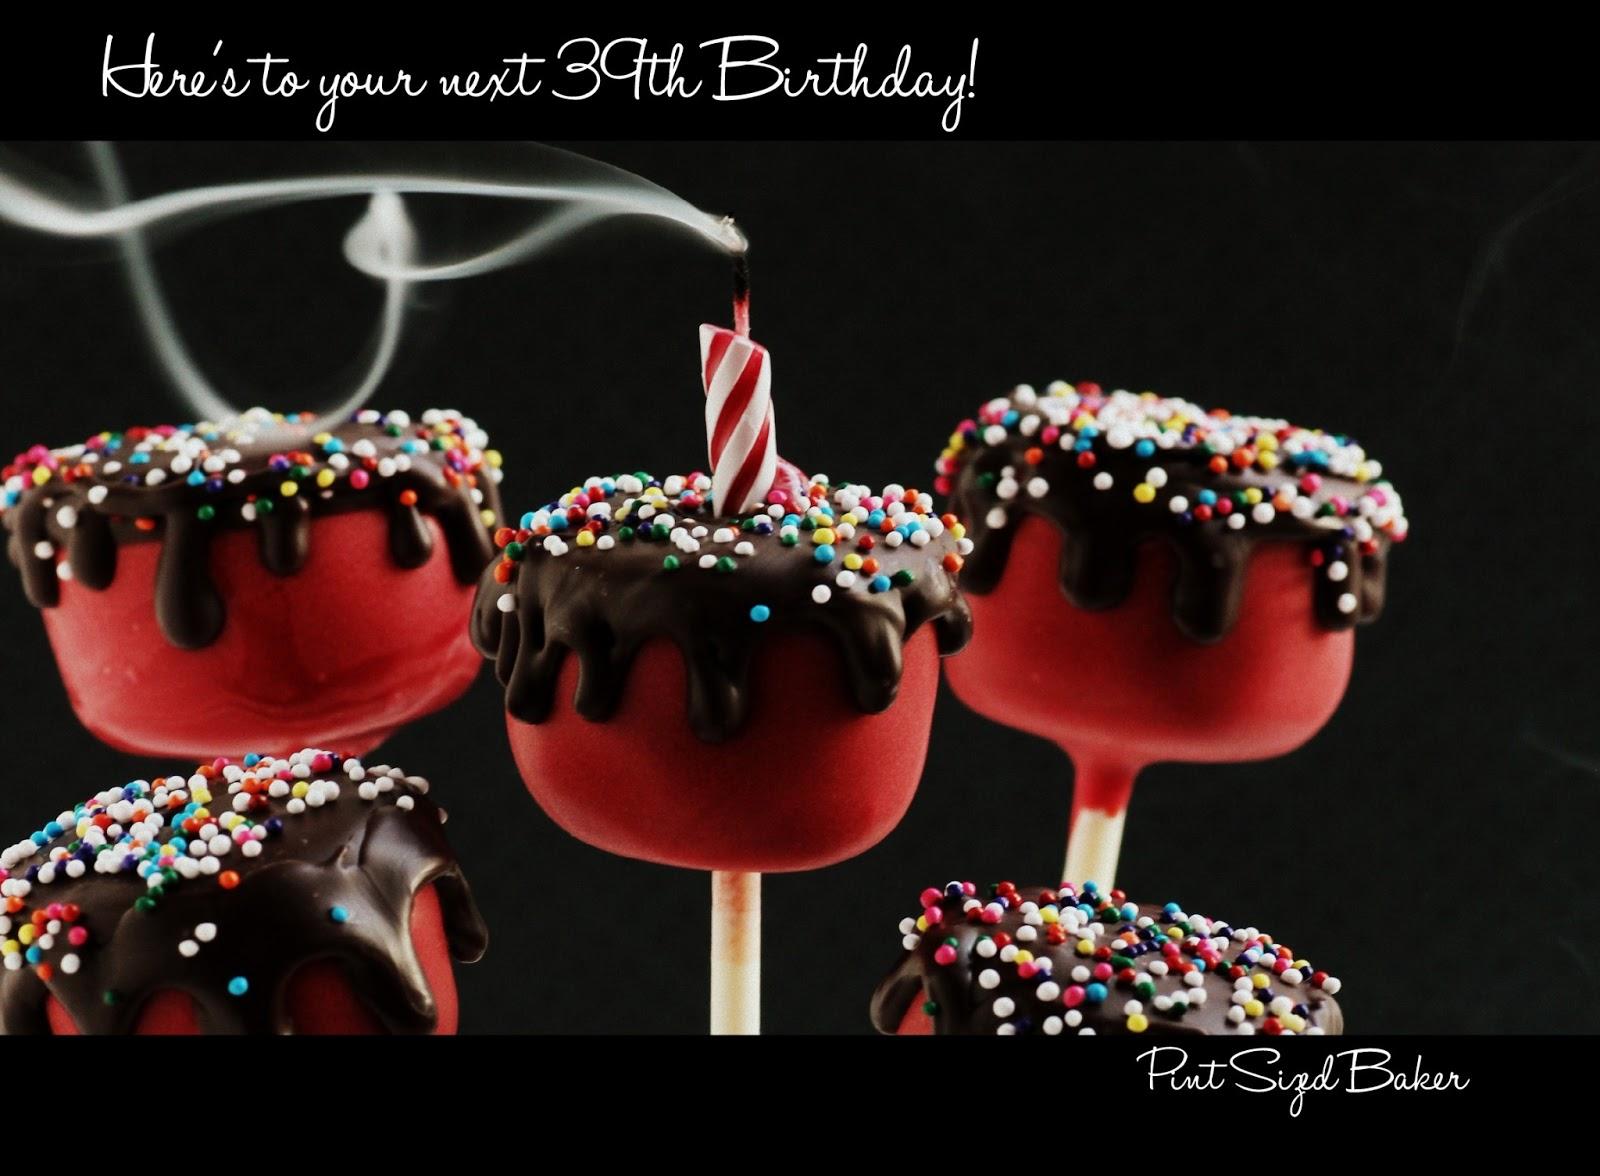 Happy Birthday Cake Cake Pops Pint Sized Baker